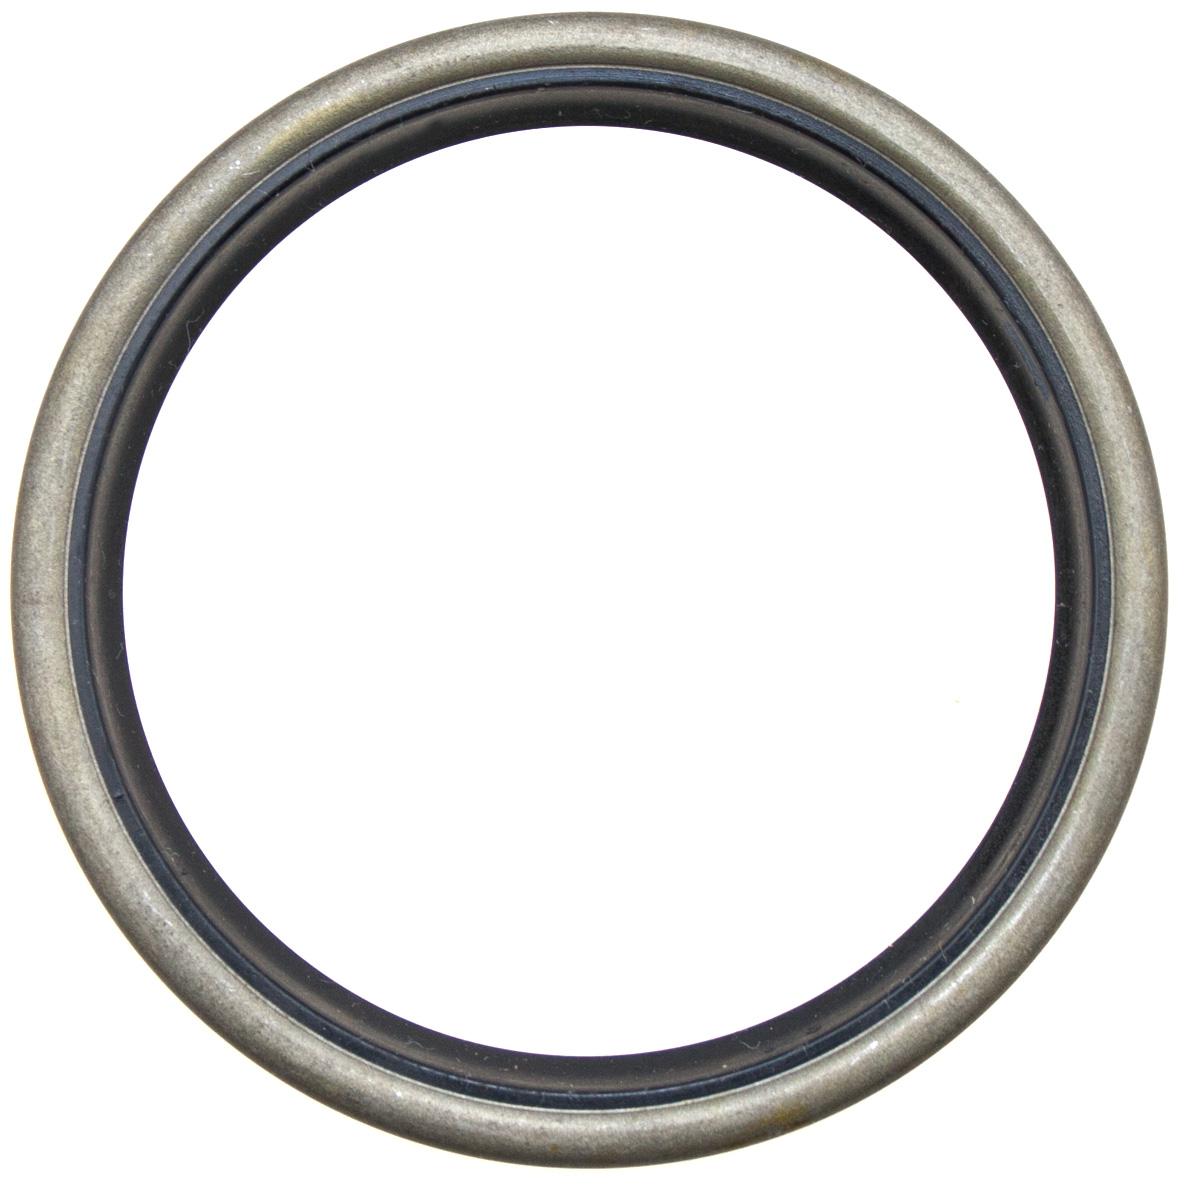 10 Radial-Wellendichtringe 50 x 62 x 7 mm D1 NBR 70